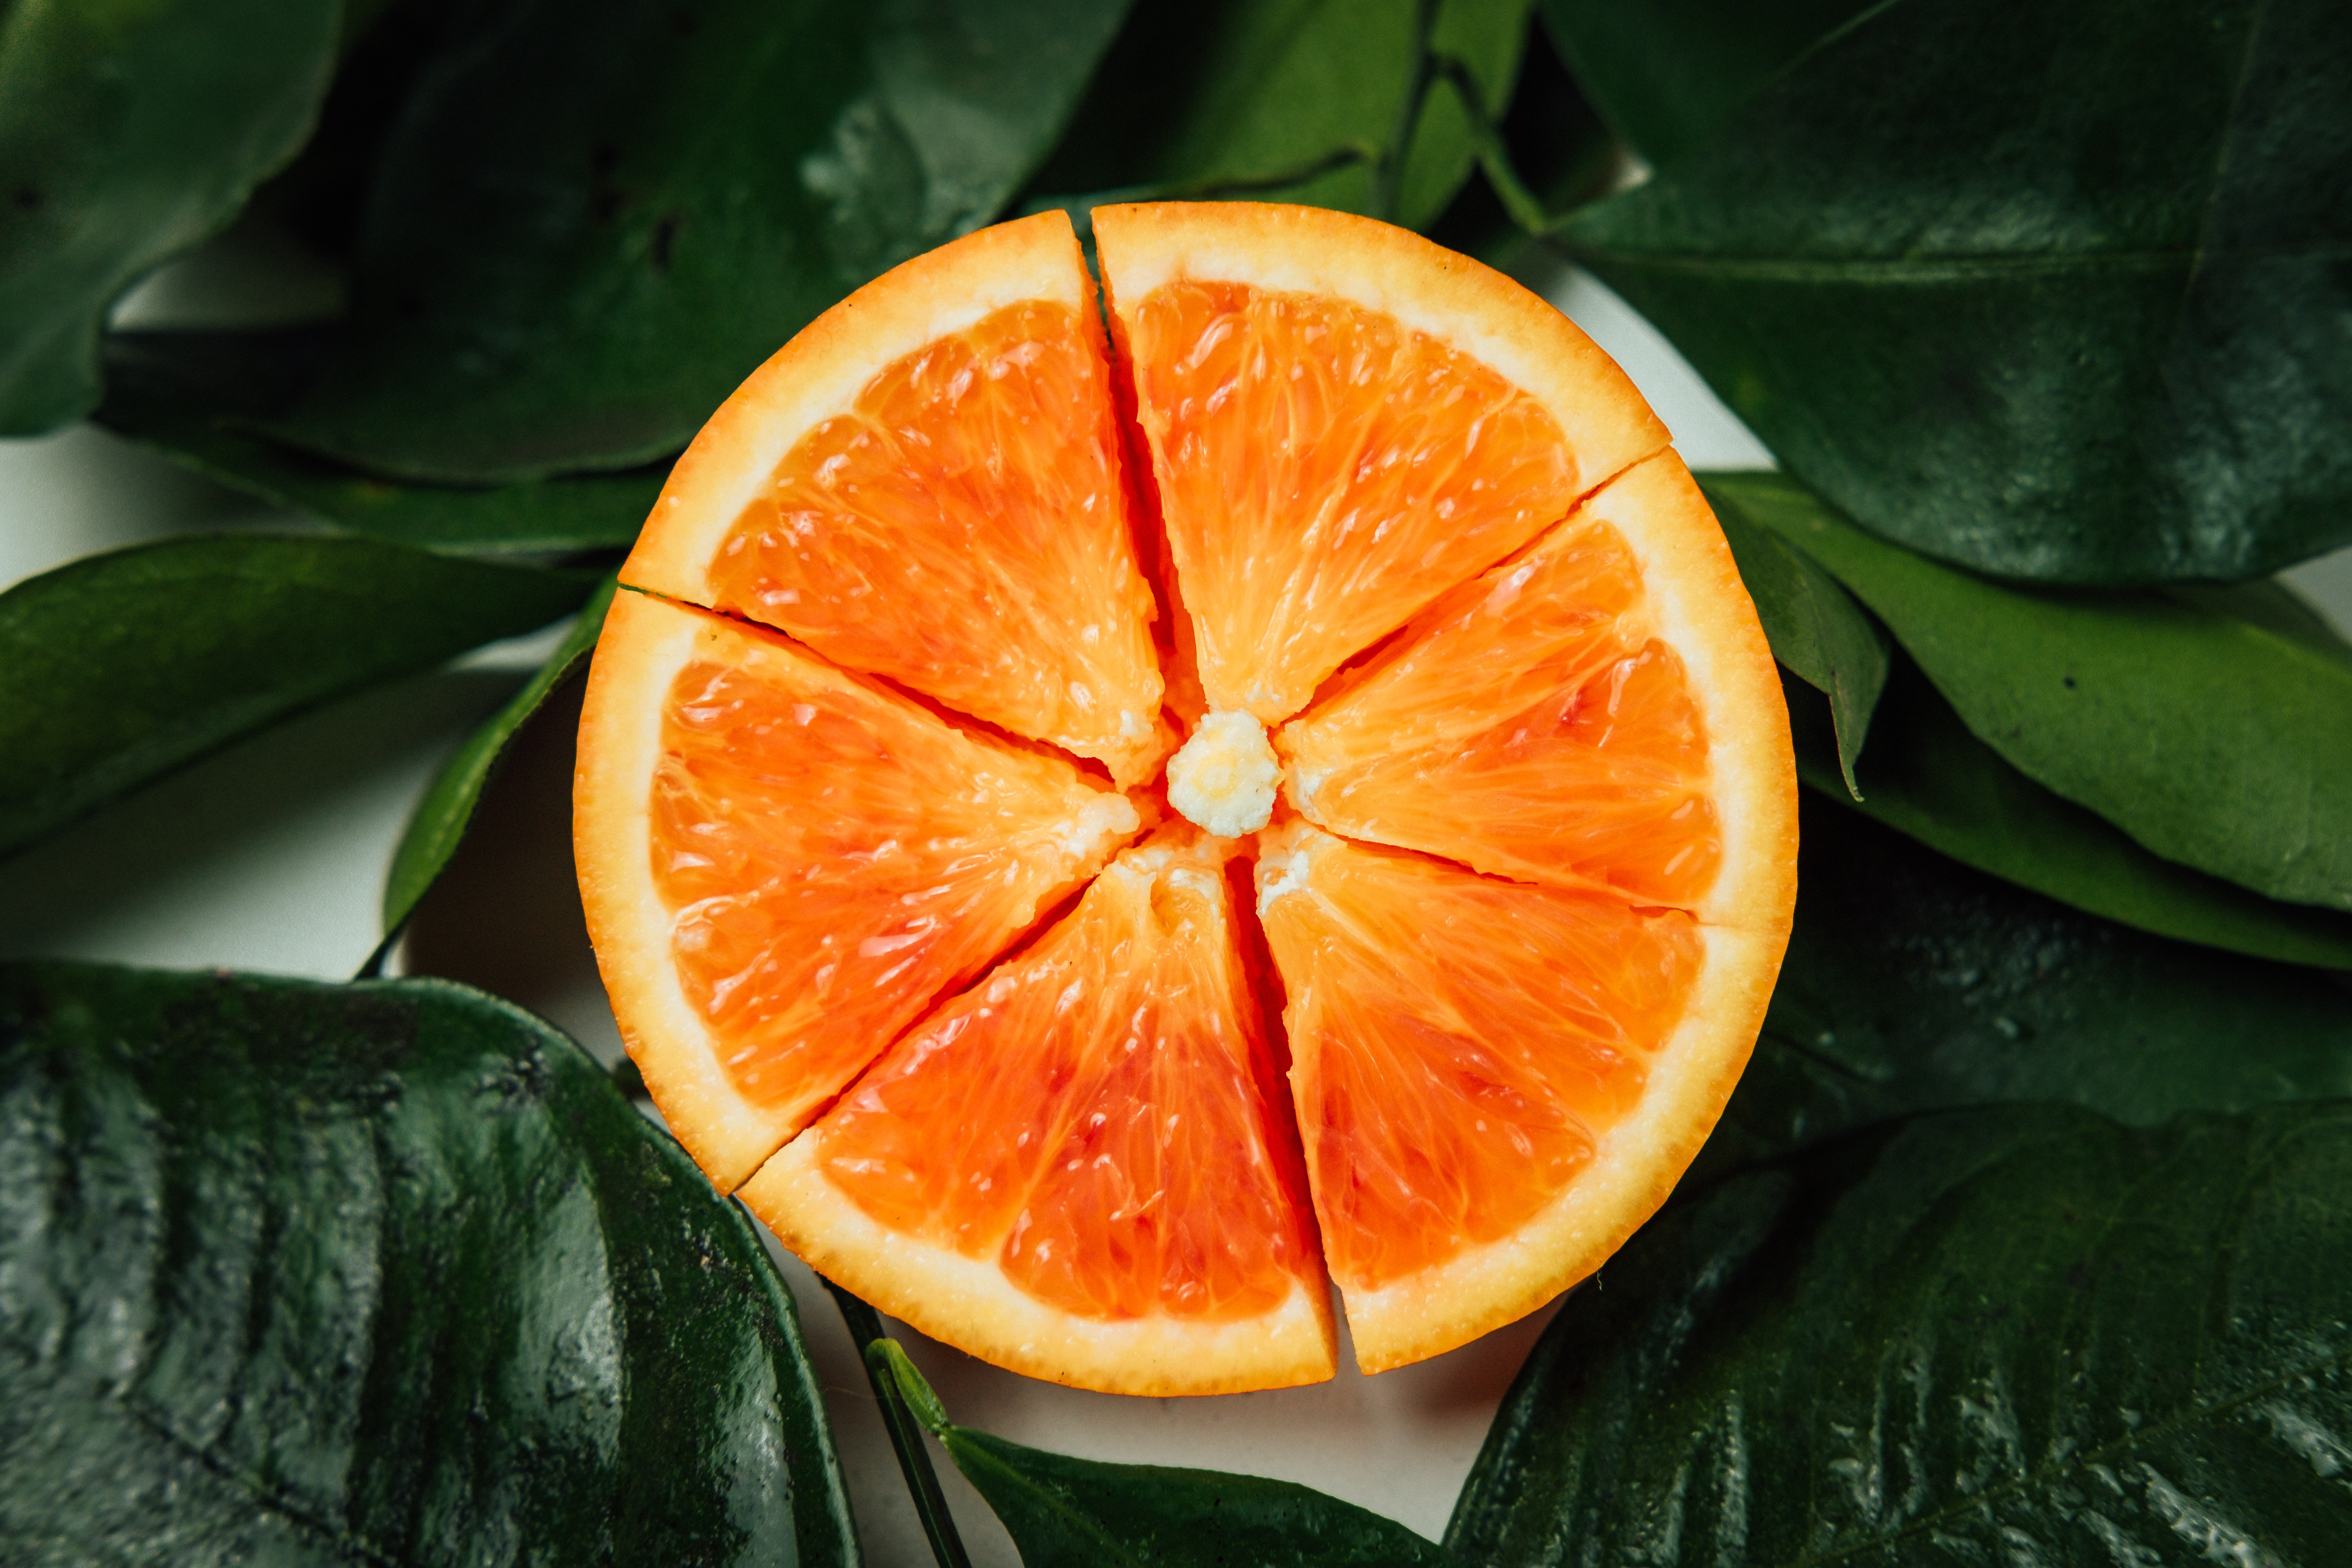 Half an orange split into segments like a pie chart